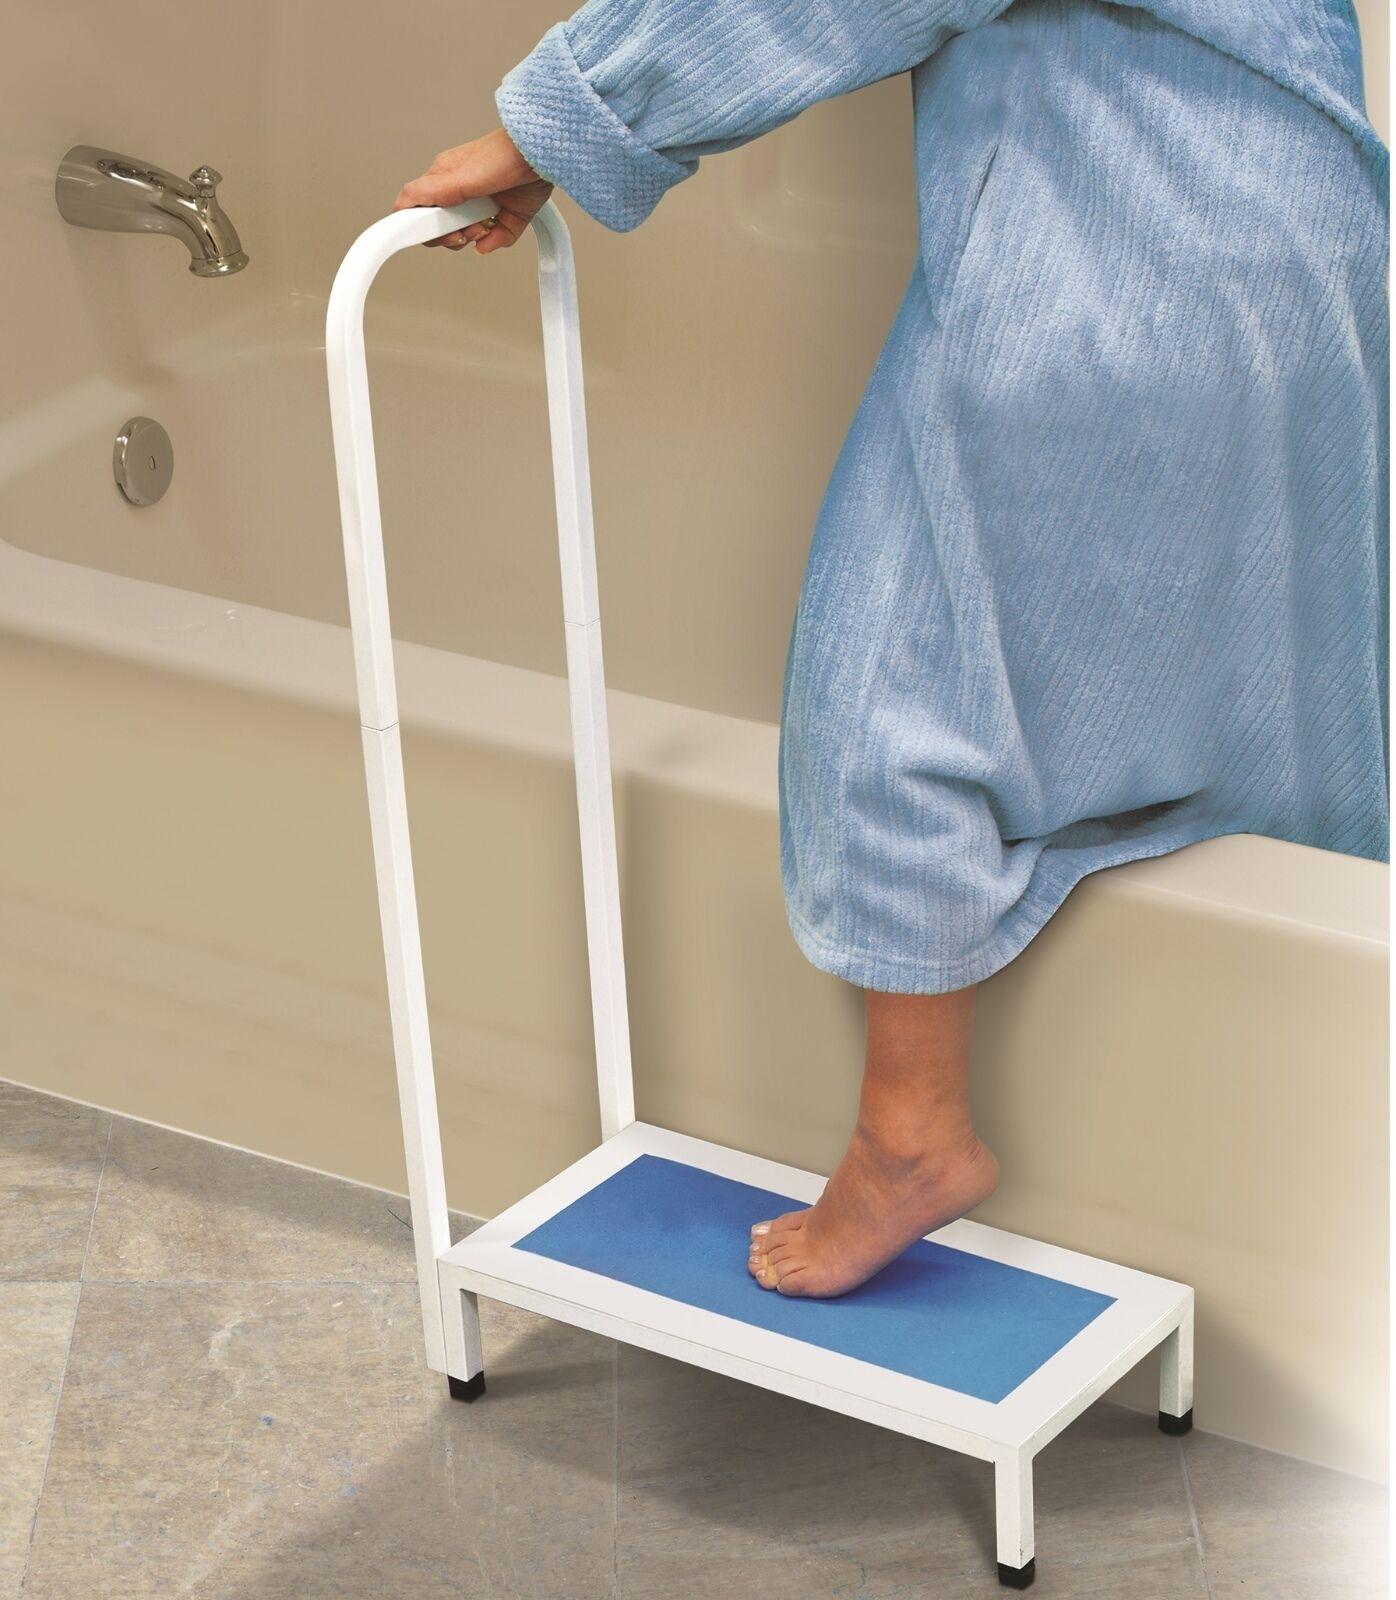 Bath Step With Handle Non Slip Surface Sturdy Aid Bathroom 500LBS NEW Shower NEW